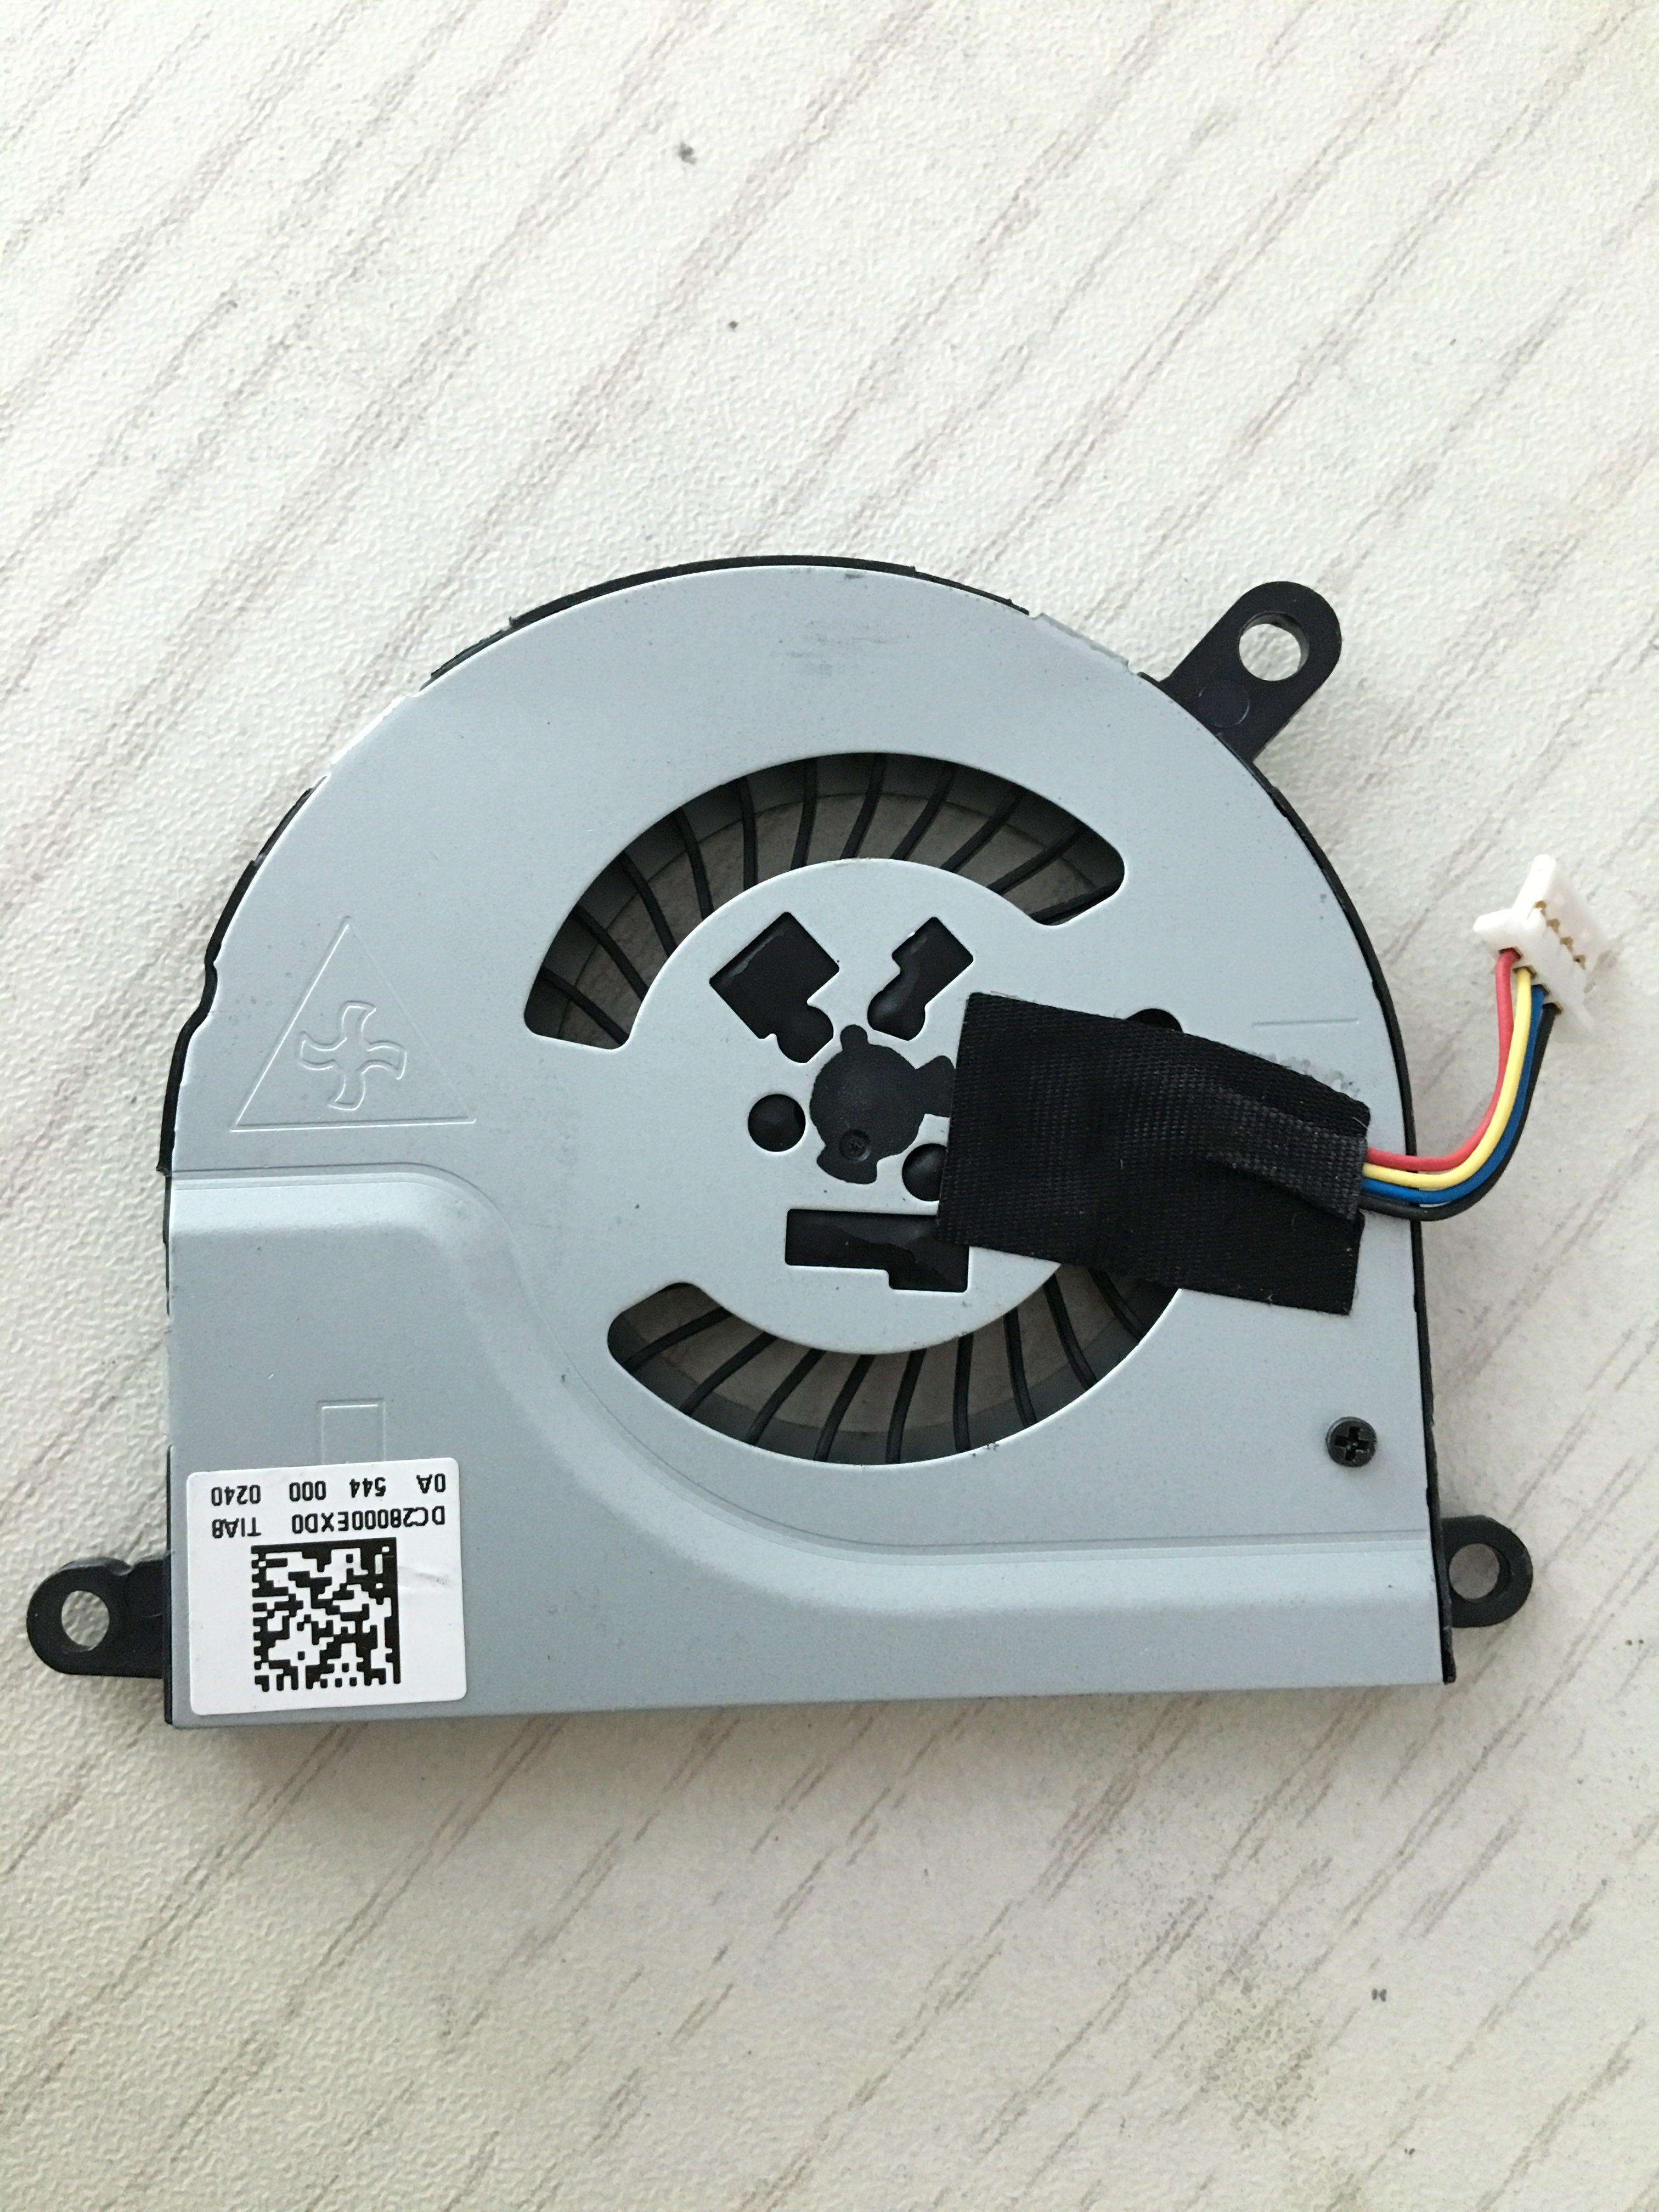 original for HP Probook 430 G2 fan cooler 768199-001 DC28000EXD0